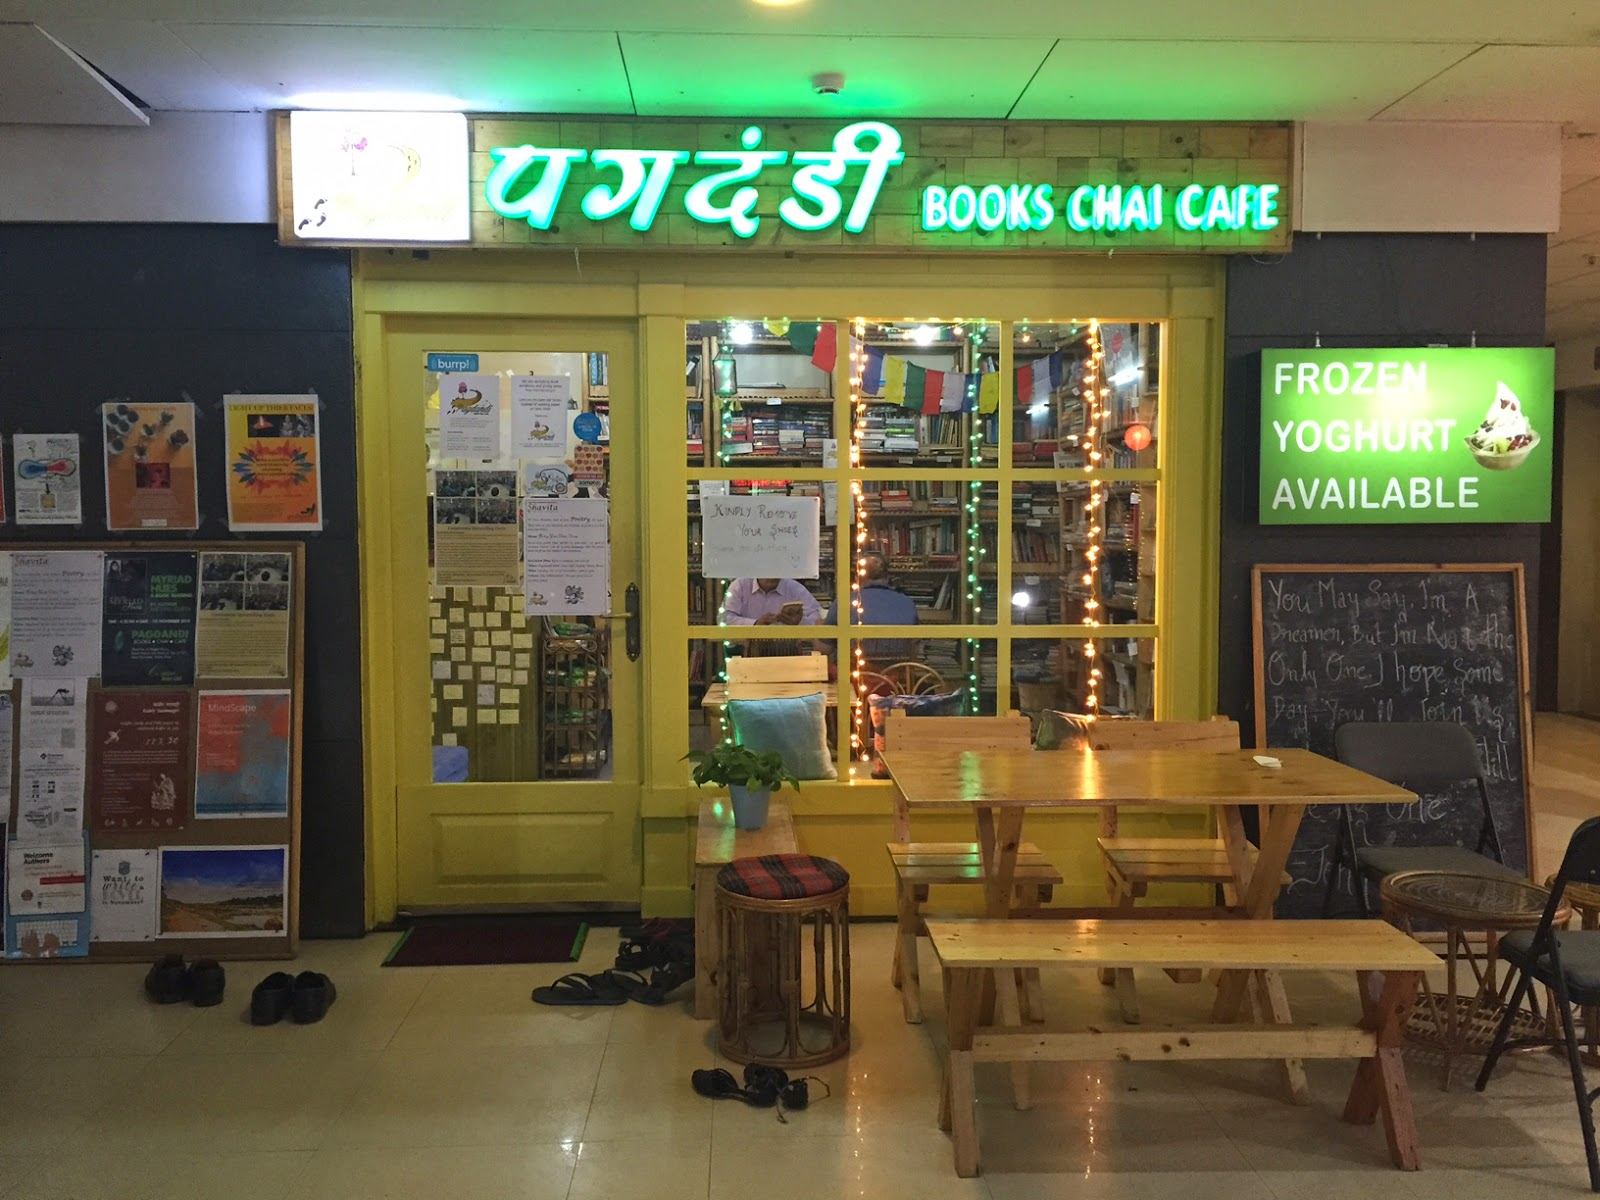 Review Pagdandi Books Chai Cafe Baner Pashan Road Pune night